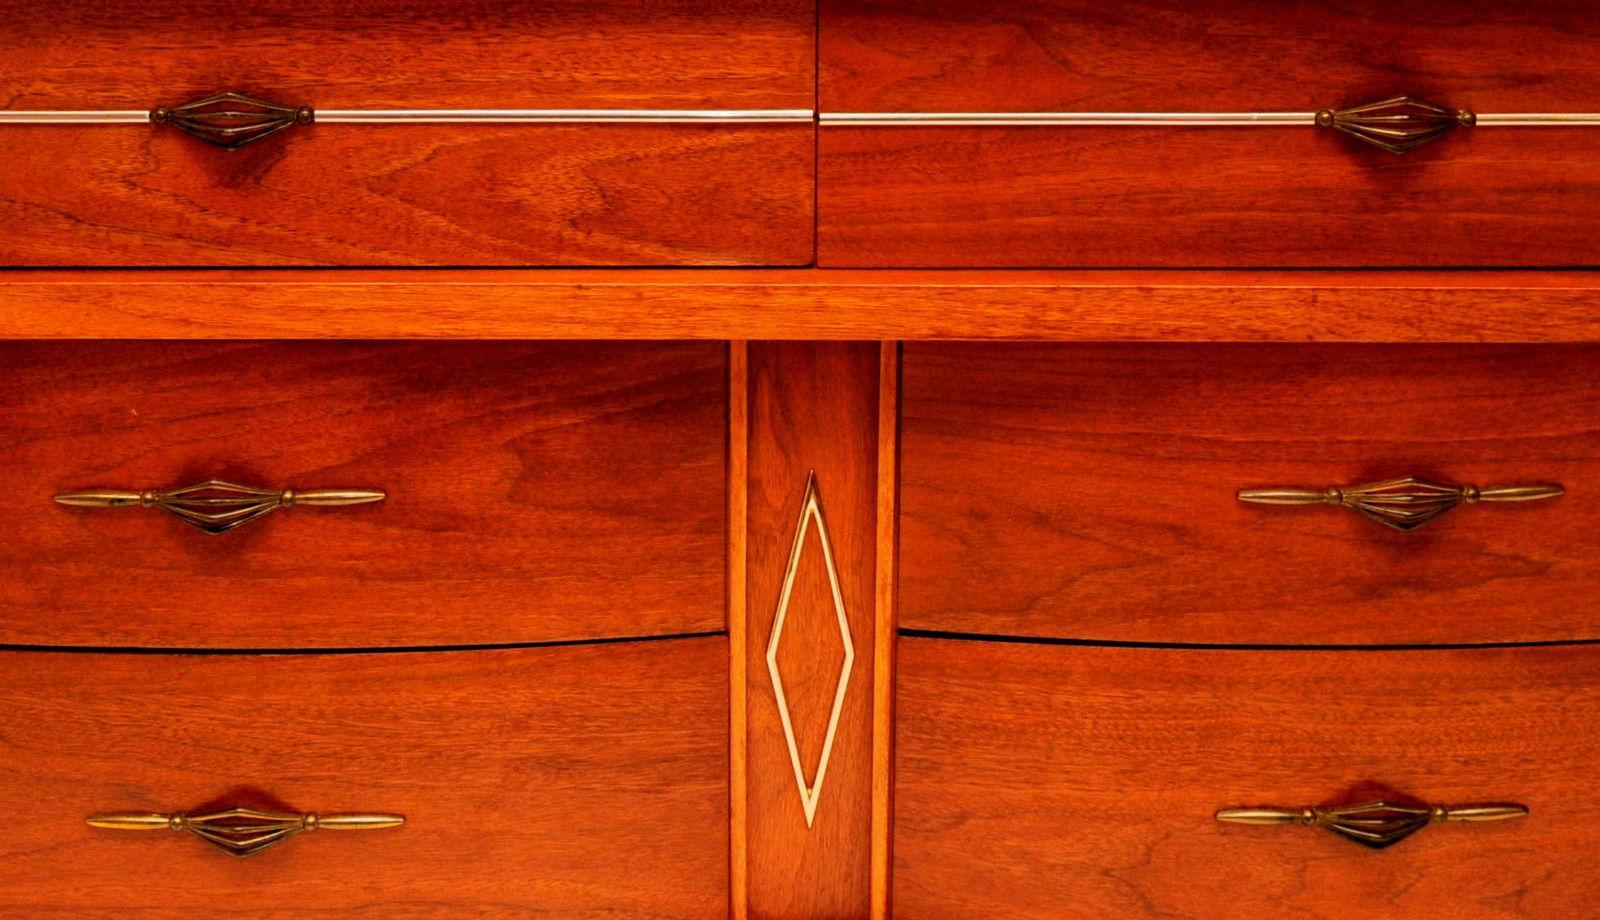 Mid Century Modern Mid Century Harmony House 6 Drawer Credenza Dresser For  Sale